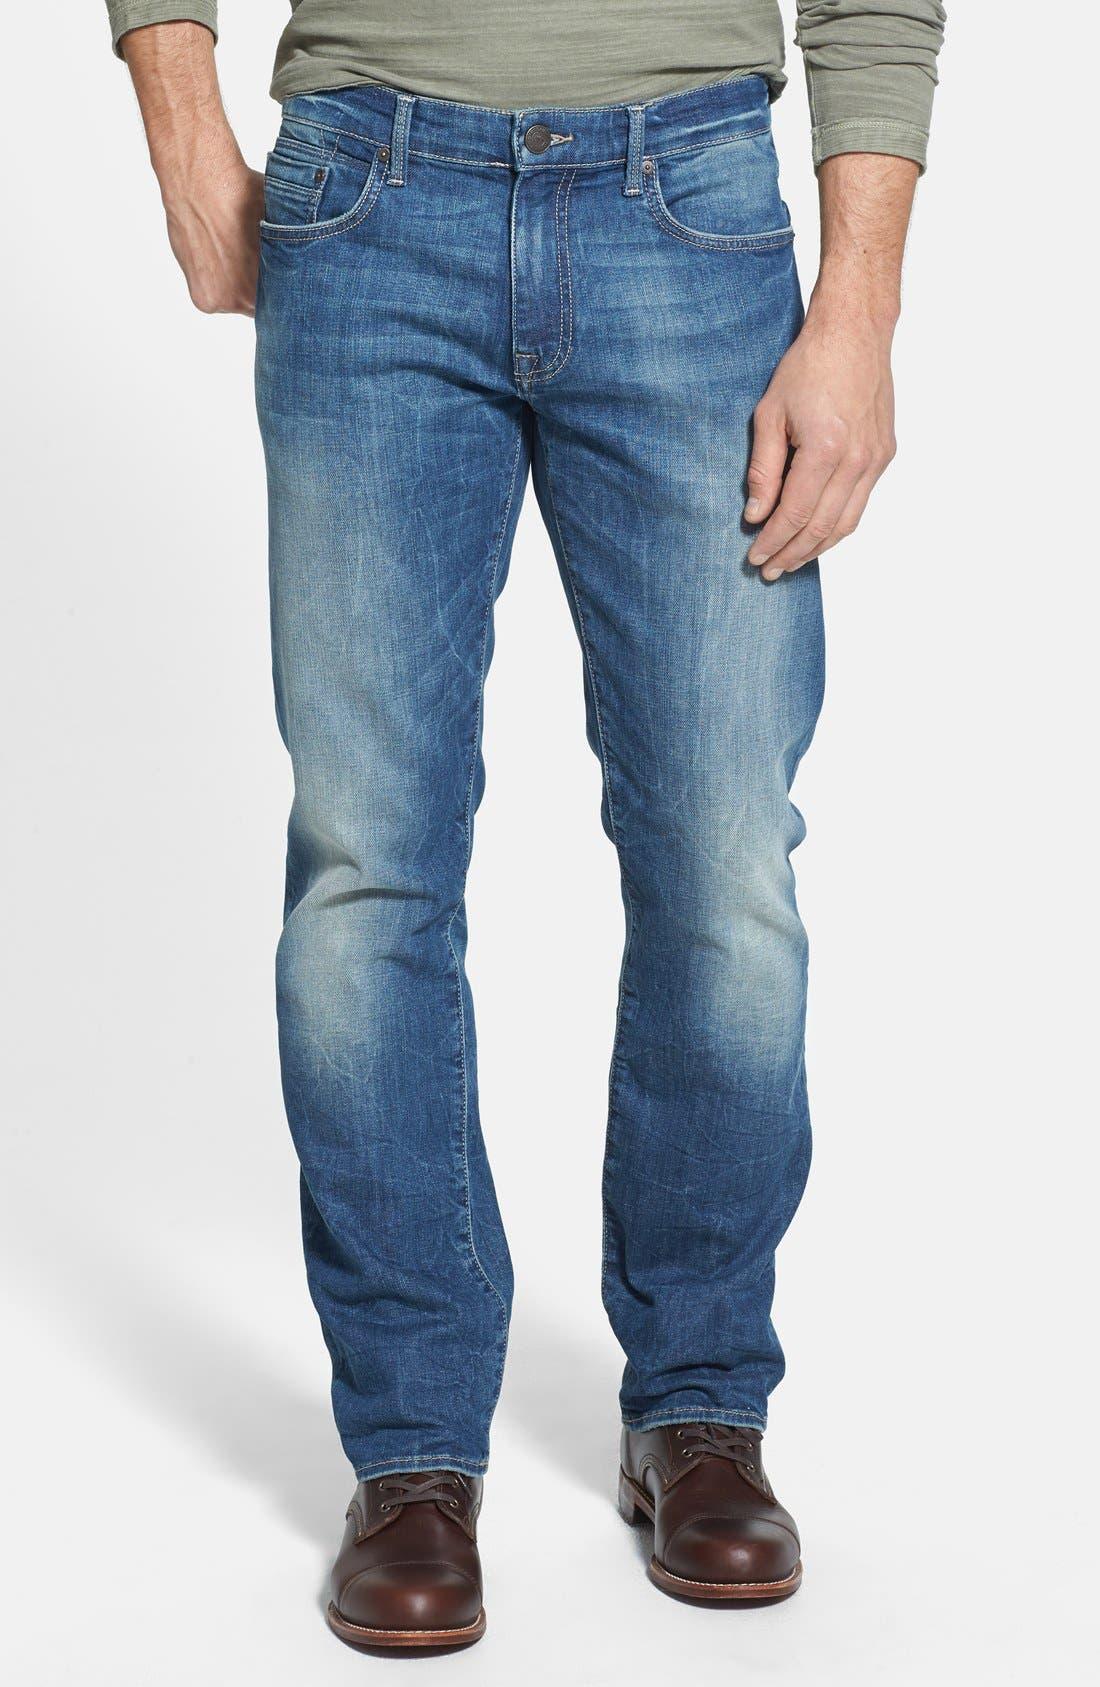 Alternate Image 1 Selected - Mavi Jeans 'Zach' Straight Leg Jeans (Light Used Yaletown)